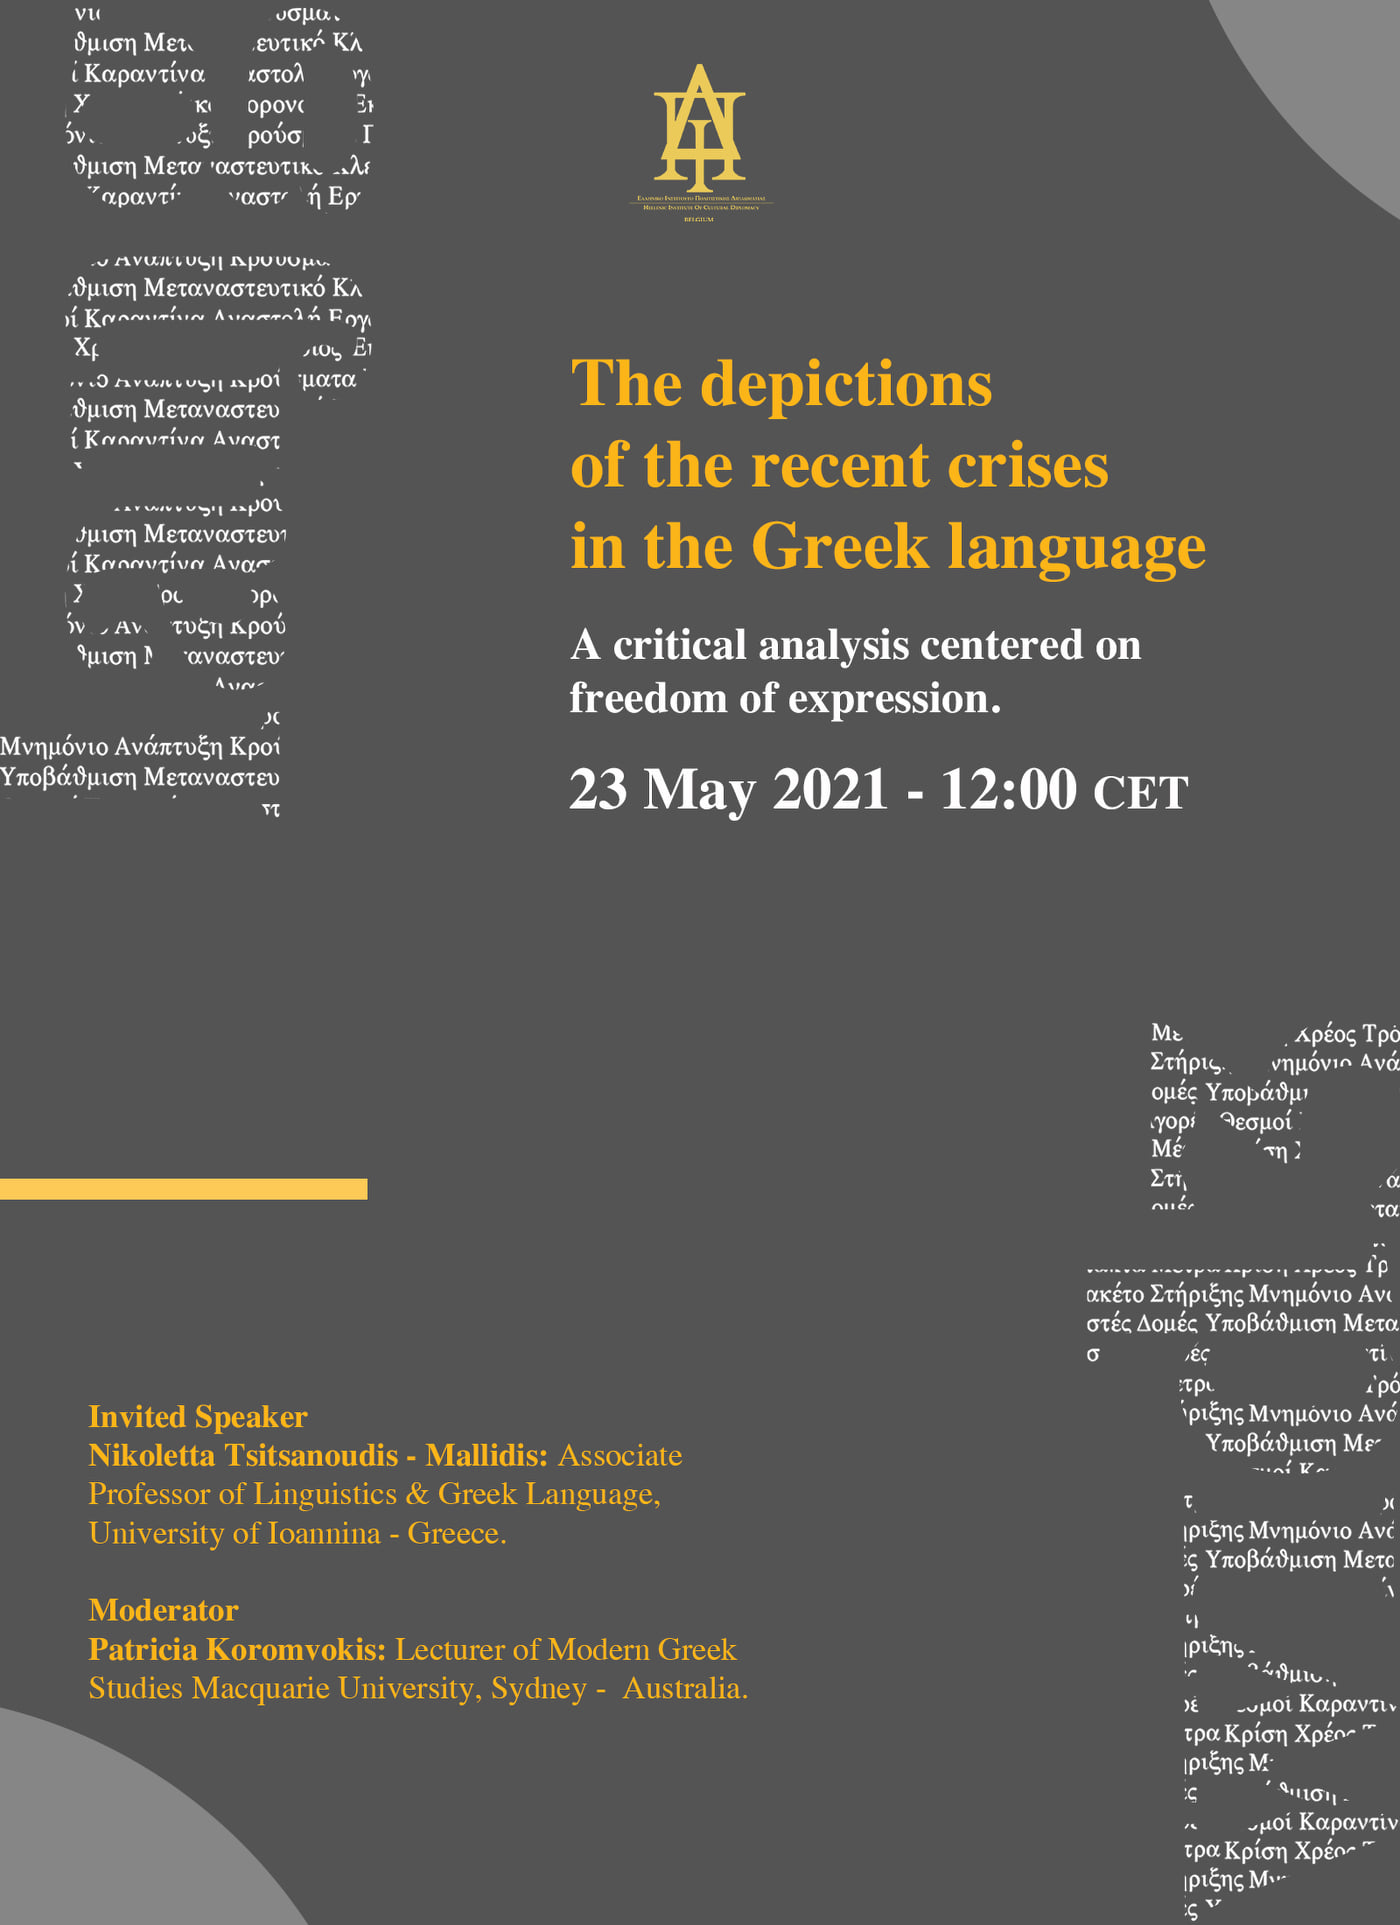 The depictions of the recent crises in the Greek language Elliniko Institouto Politistikis Diplomatias 2021